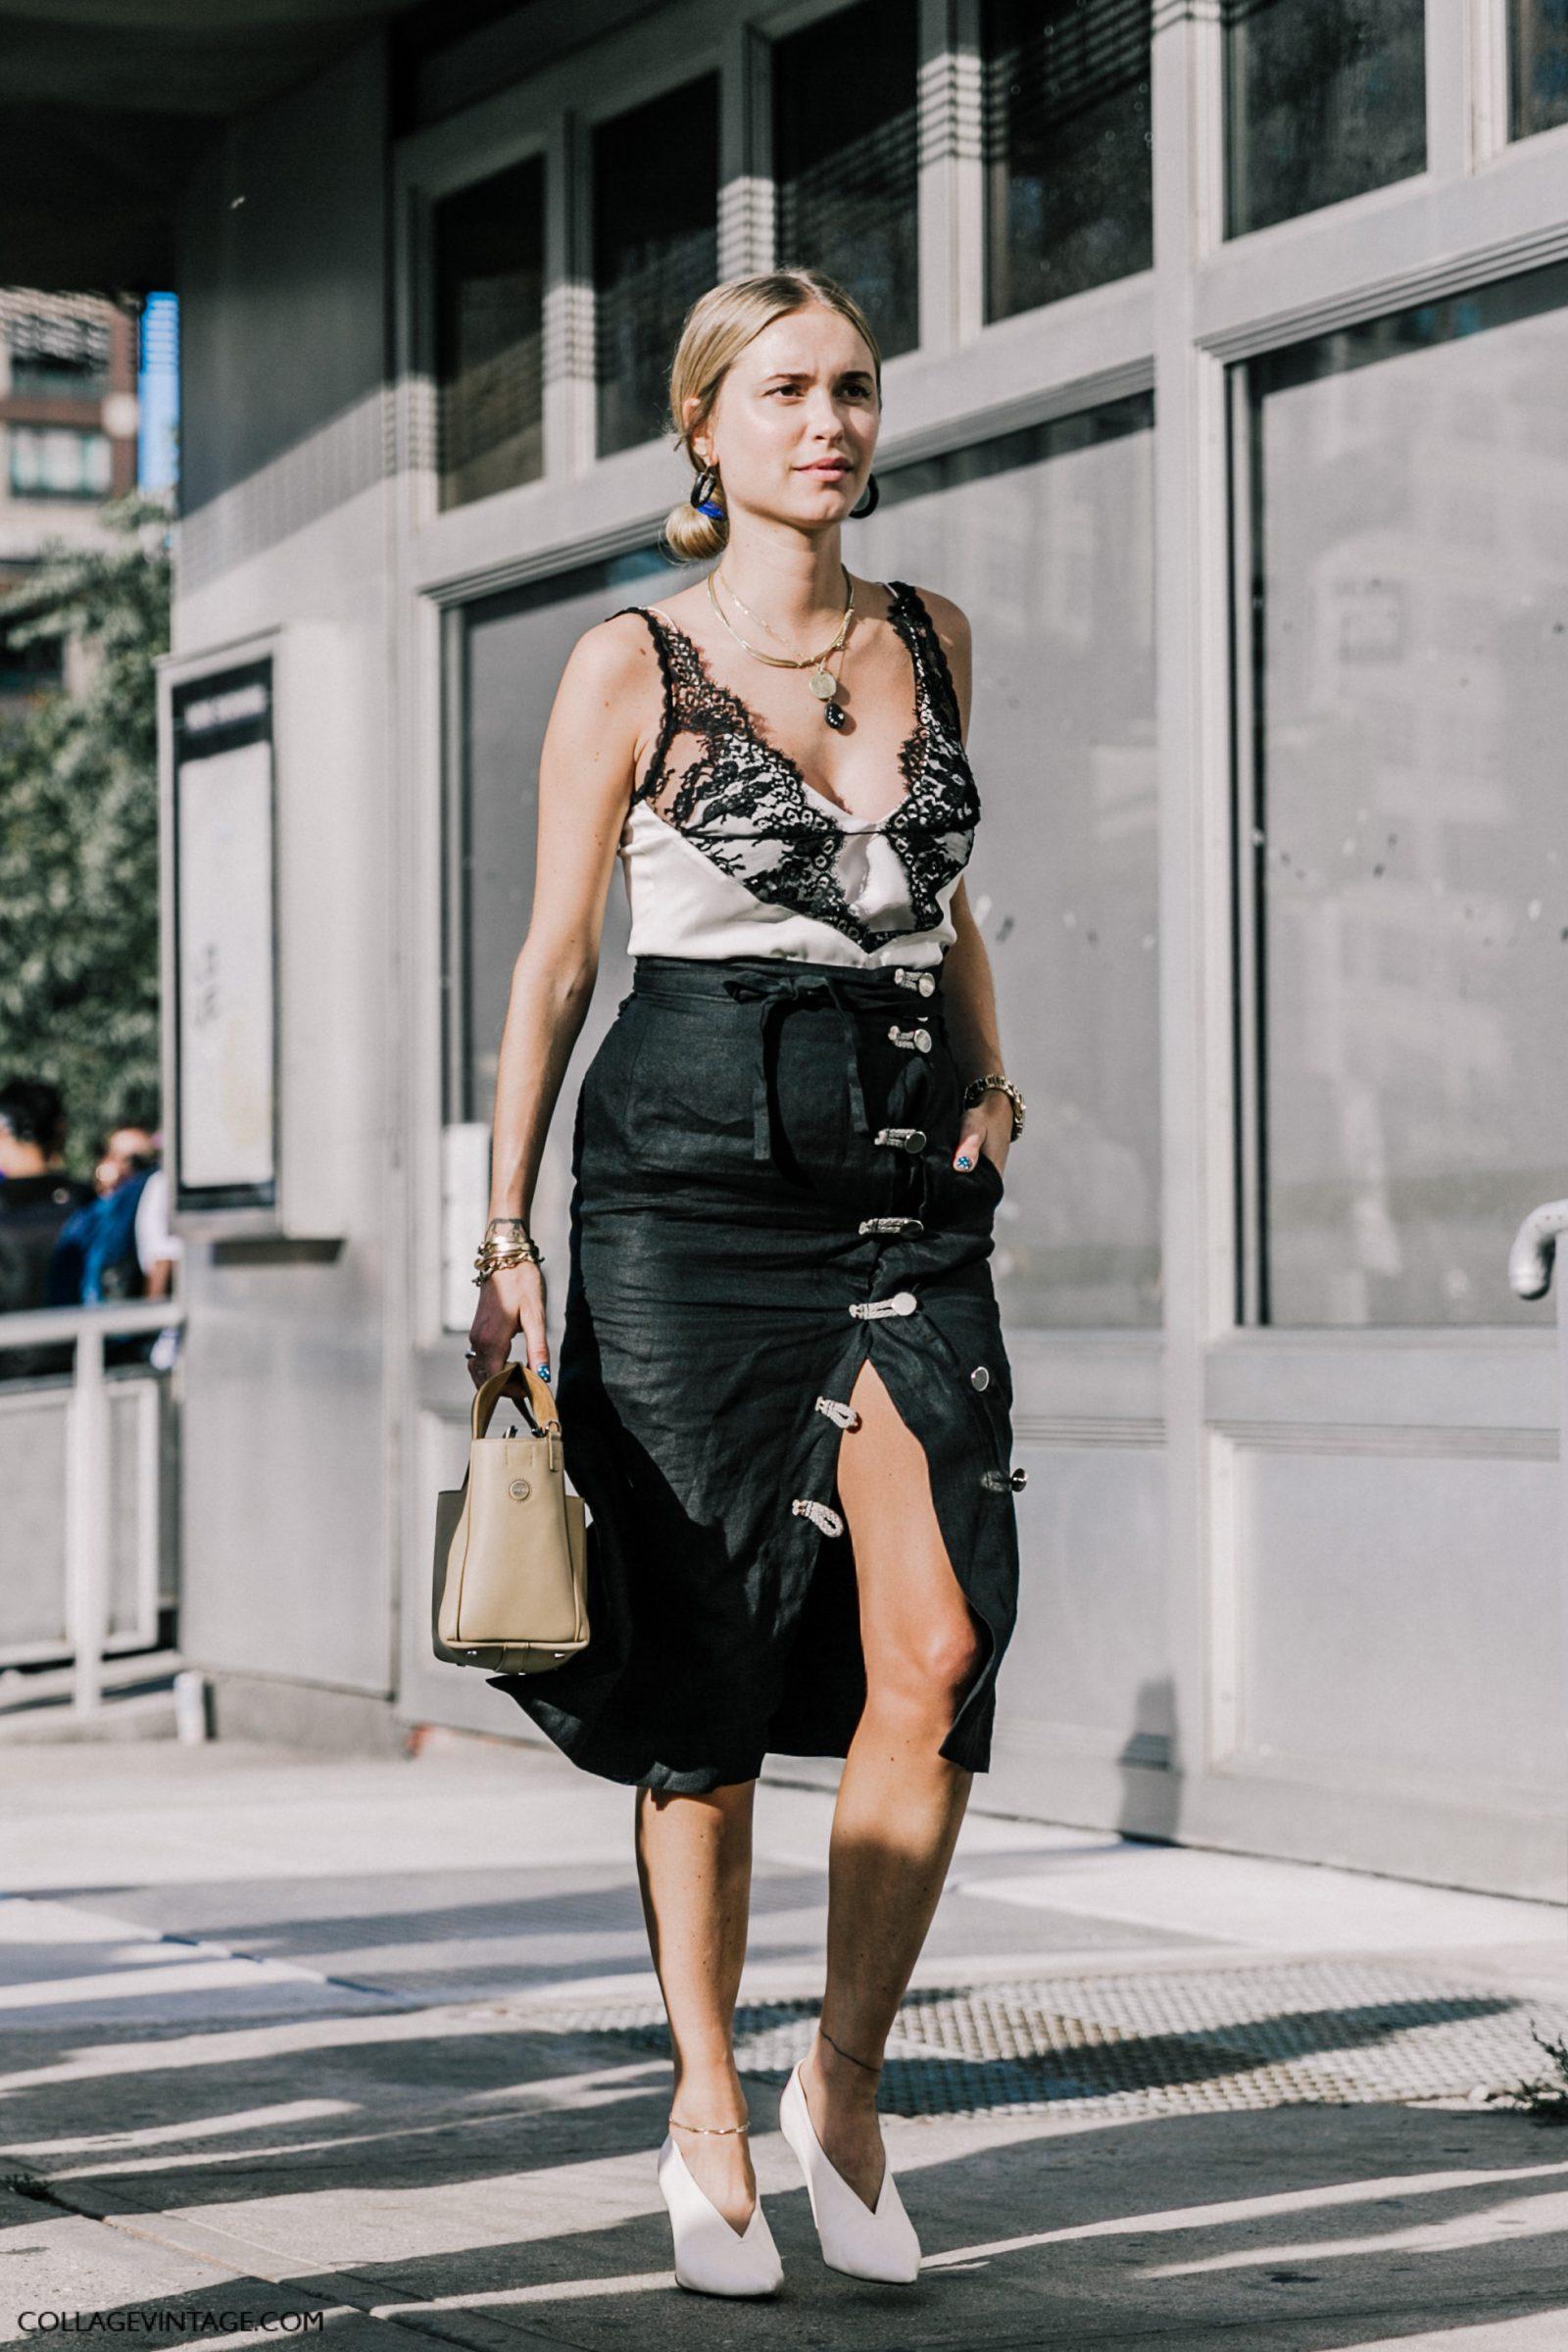 nyfw-new_york_fashion_week_ss17-street_style-outfits-collage_vintage-vintage-atuzarra-55